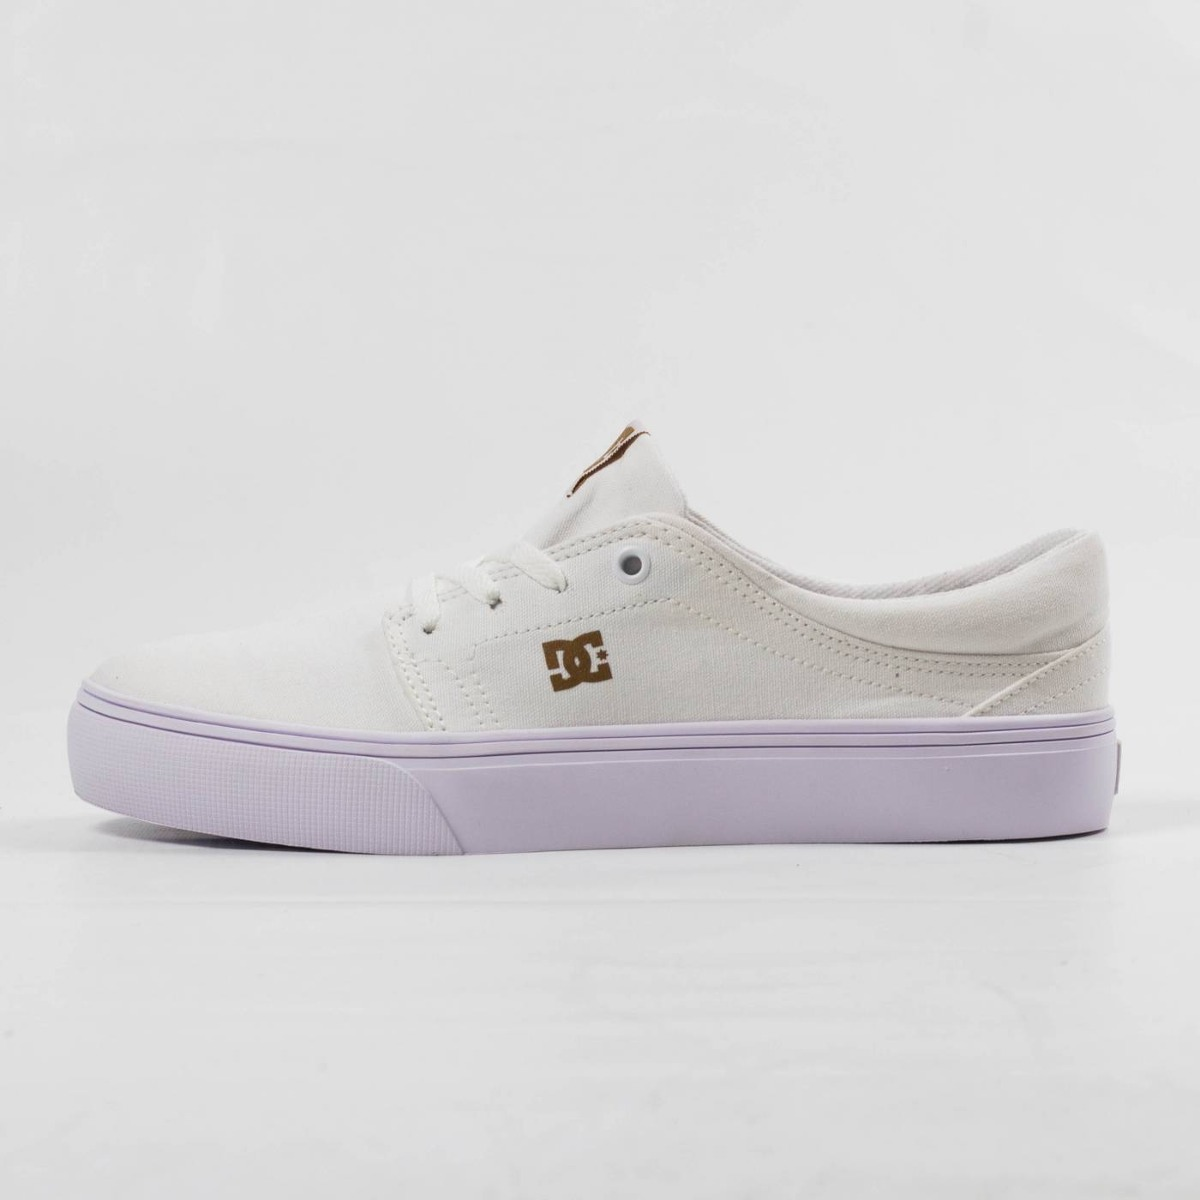 59a457db9b475 tênis dc shoes trase tx branco skate original. Carregando zoom.